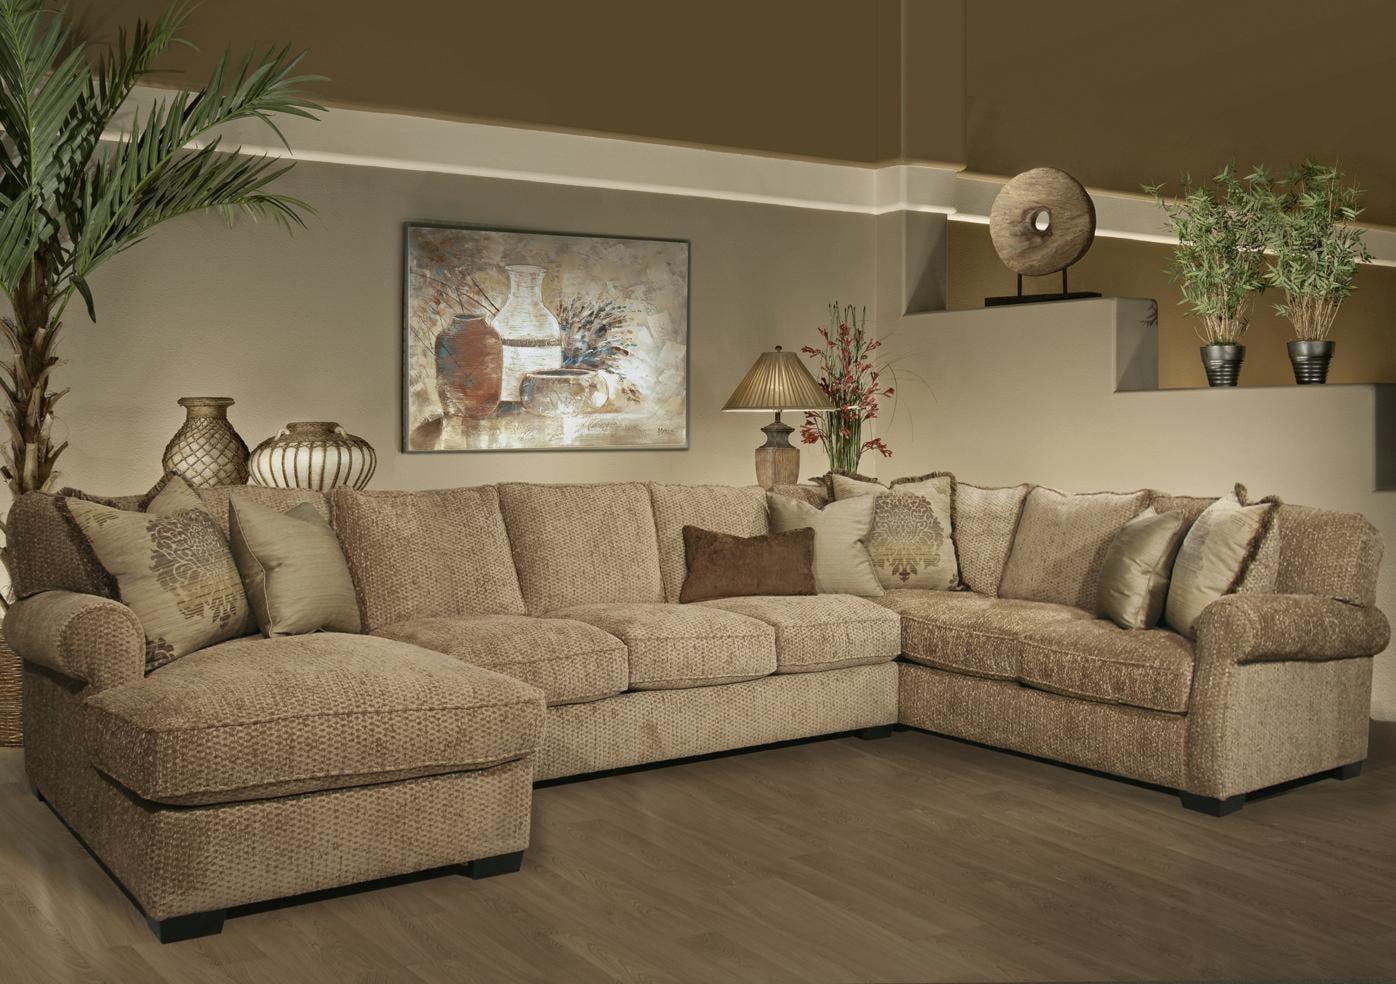 Fairmont Designs Rio Grande 3 Piece Sectional - Dream Home ...